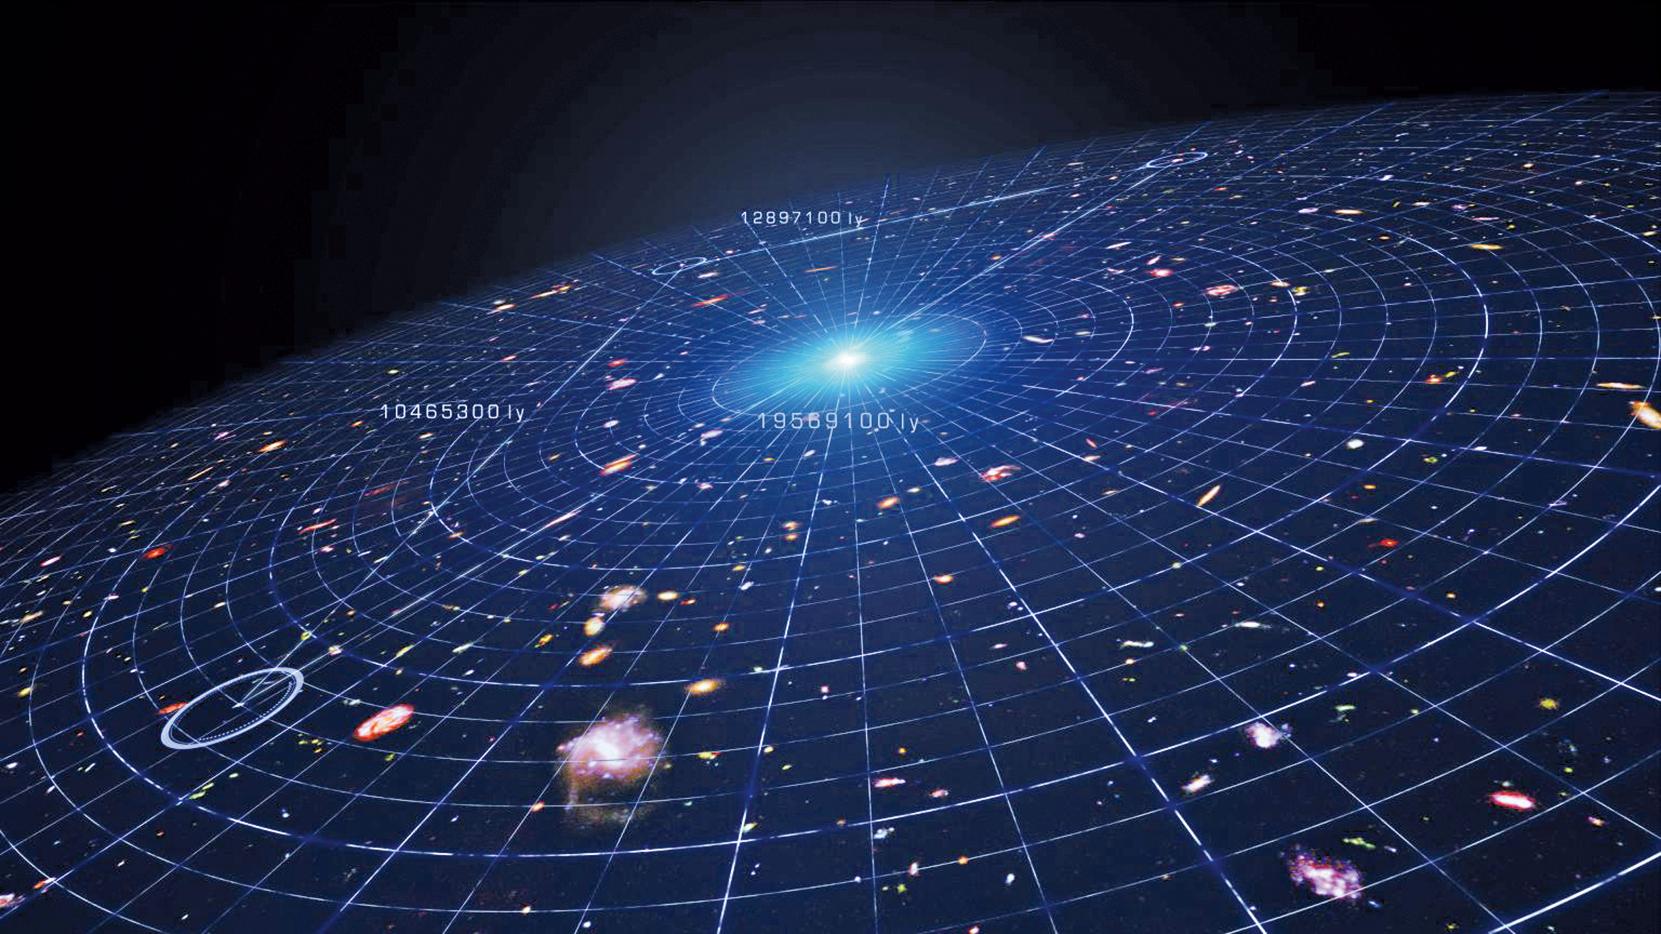 宇宙膨脹示意圖。(NASA's Goddard Space Flight Center Conceptual Image Lab)